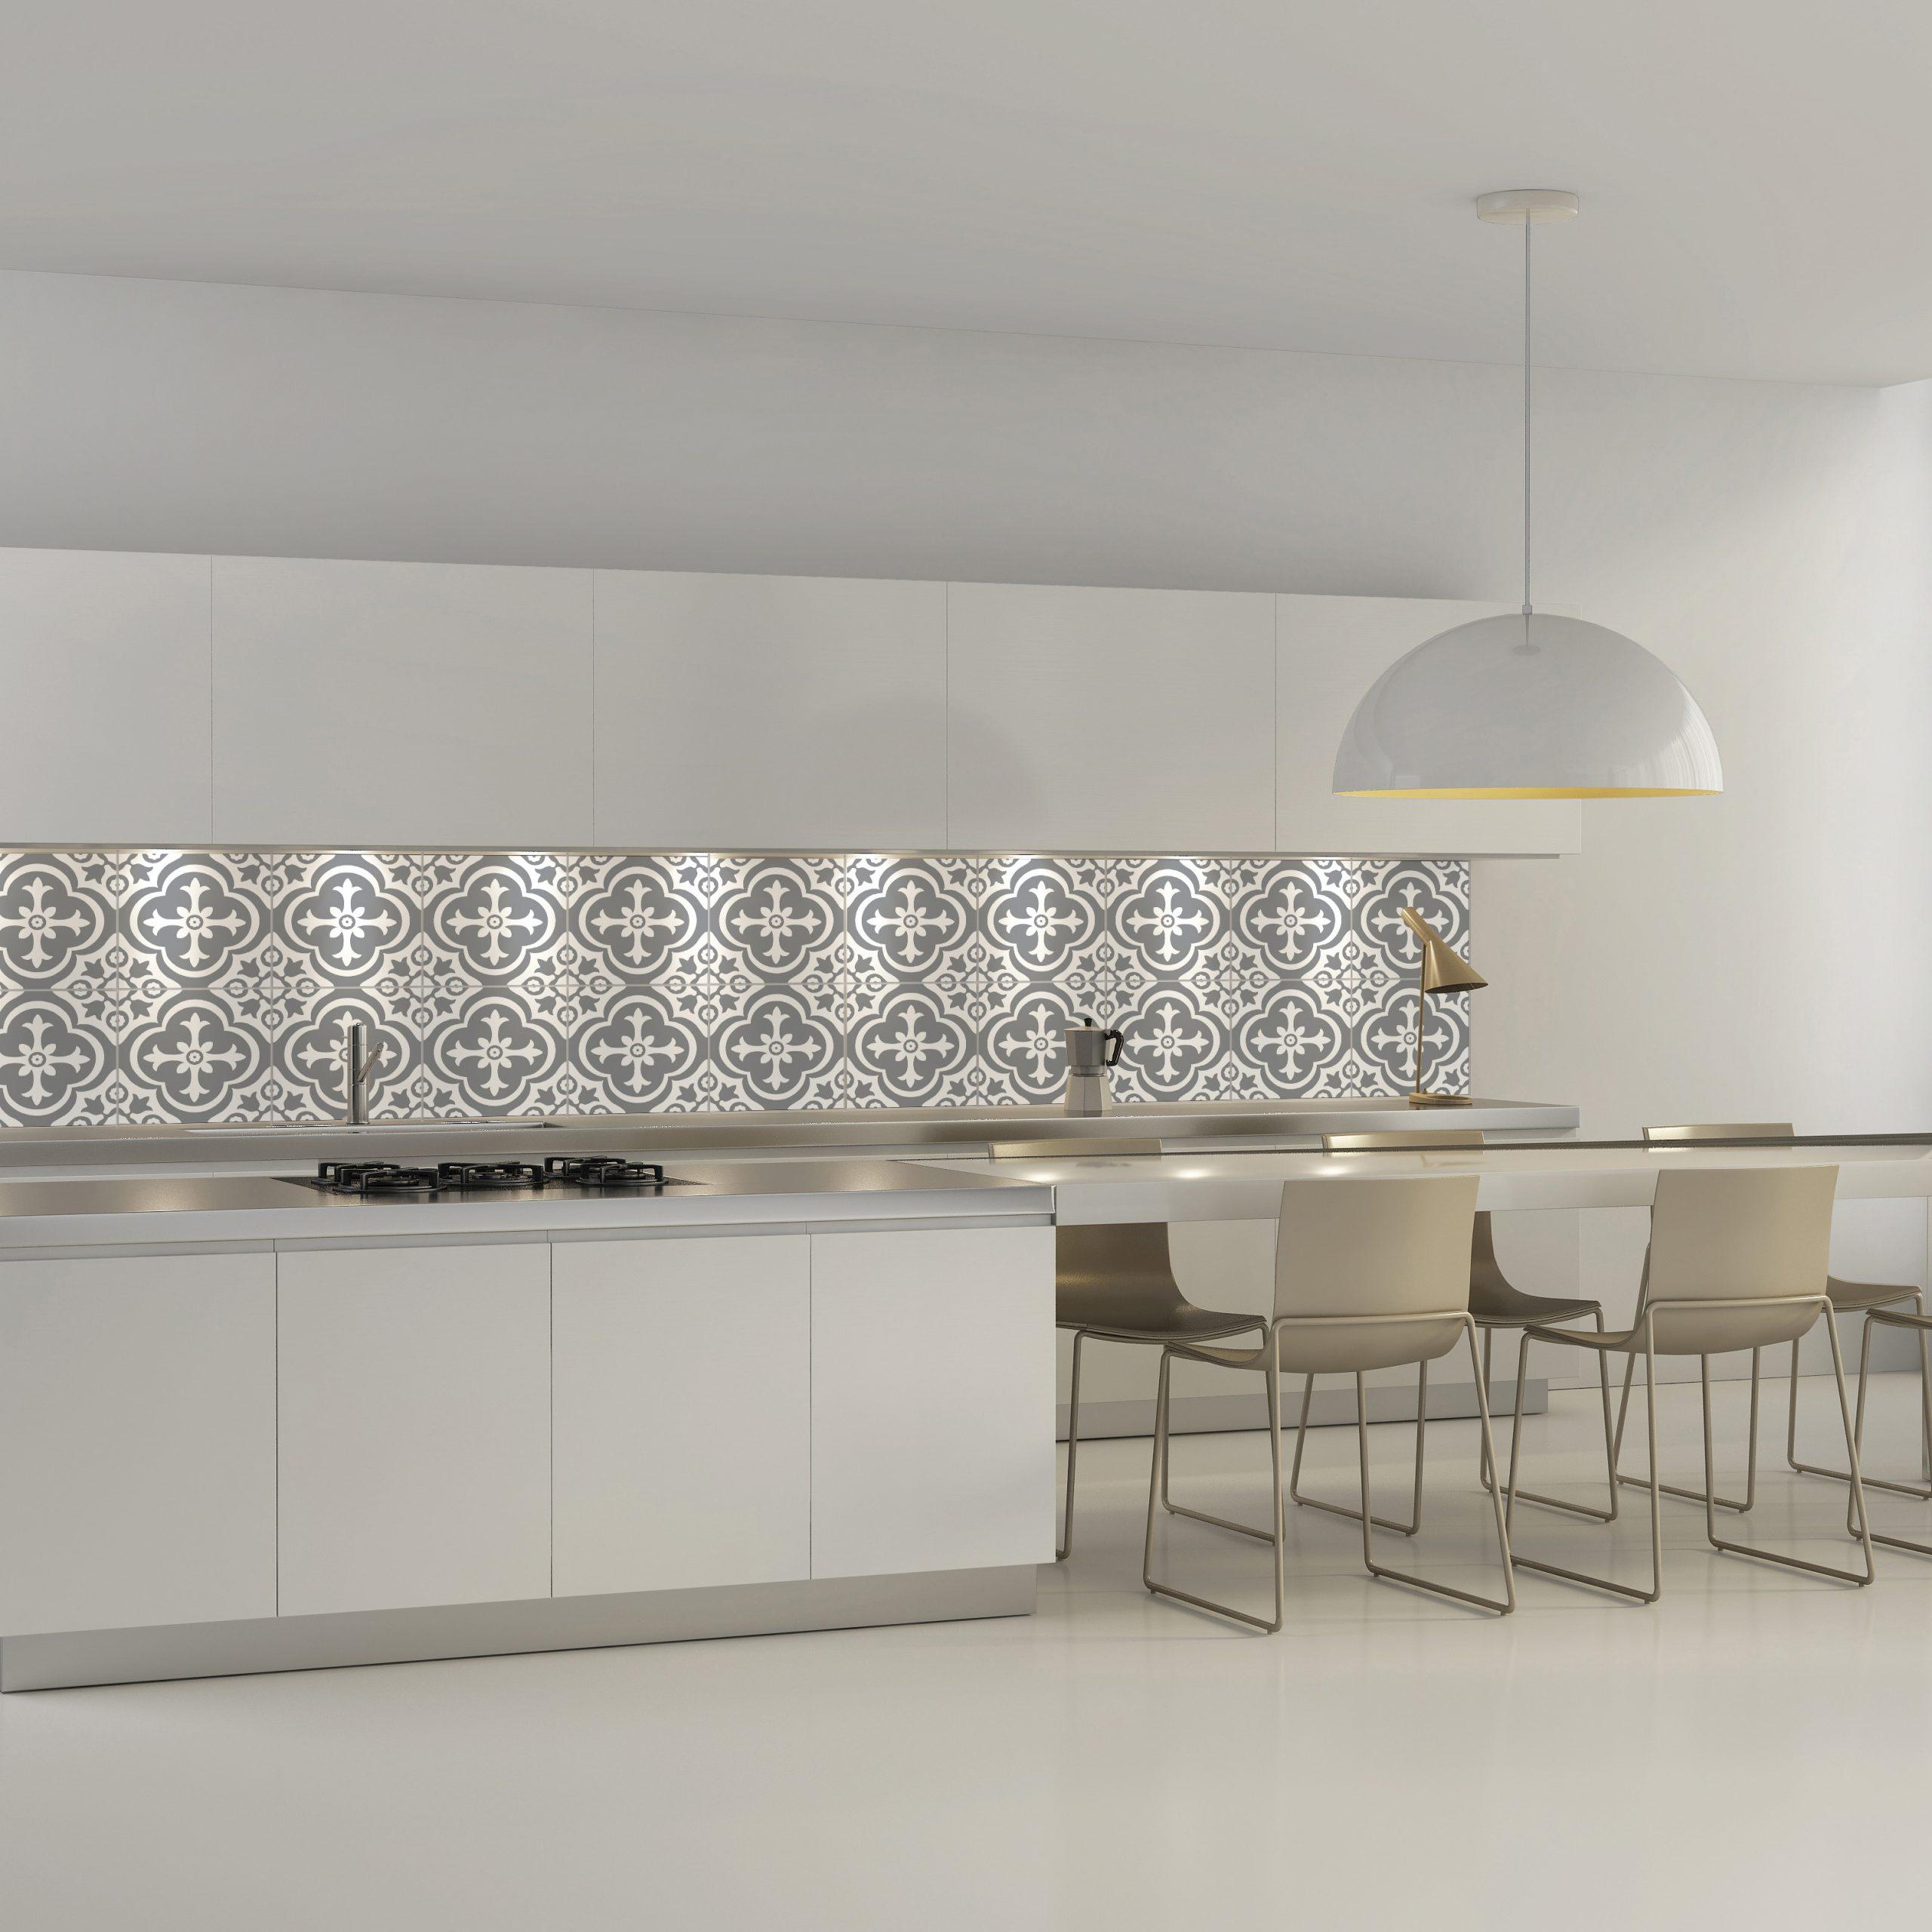 Full Size of Contemporary Minimal White Kitchen With Plastic Chairs Küche Wandfliesen Küche